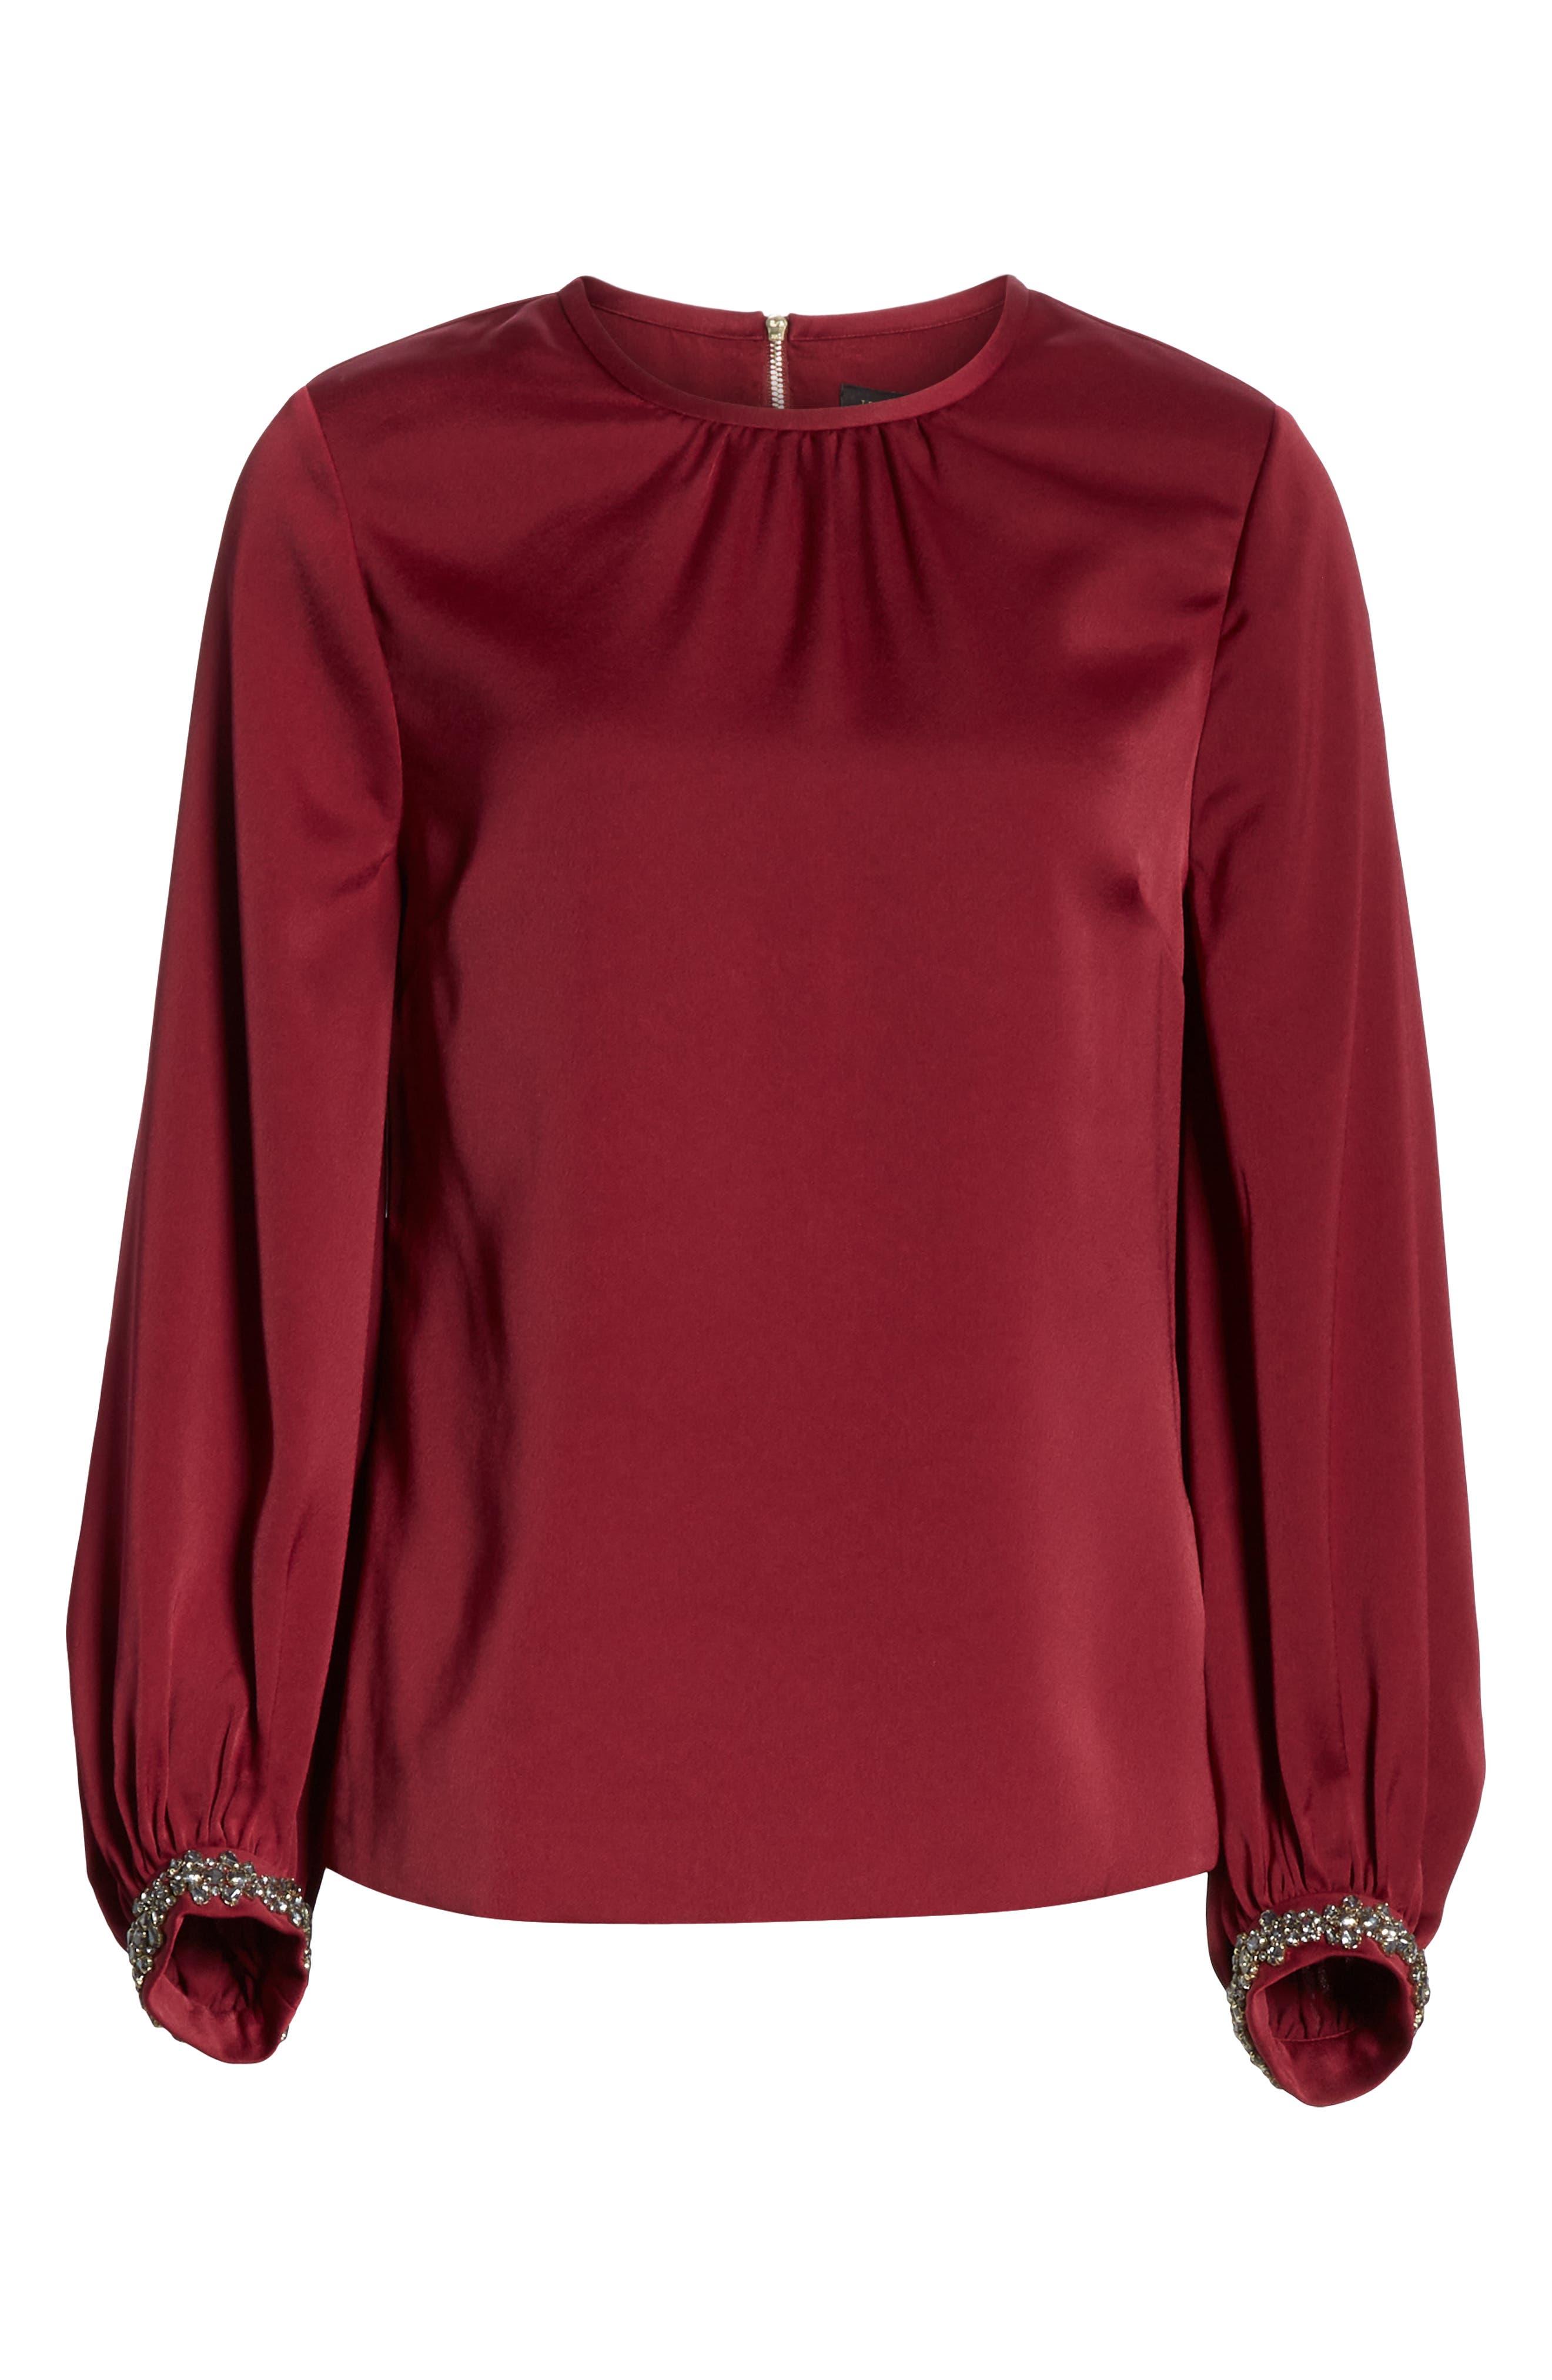 TED BAKER LONDON, Juudy Embellished Sleeve Blouse, Alternate thumbnail 6, color, 930